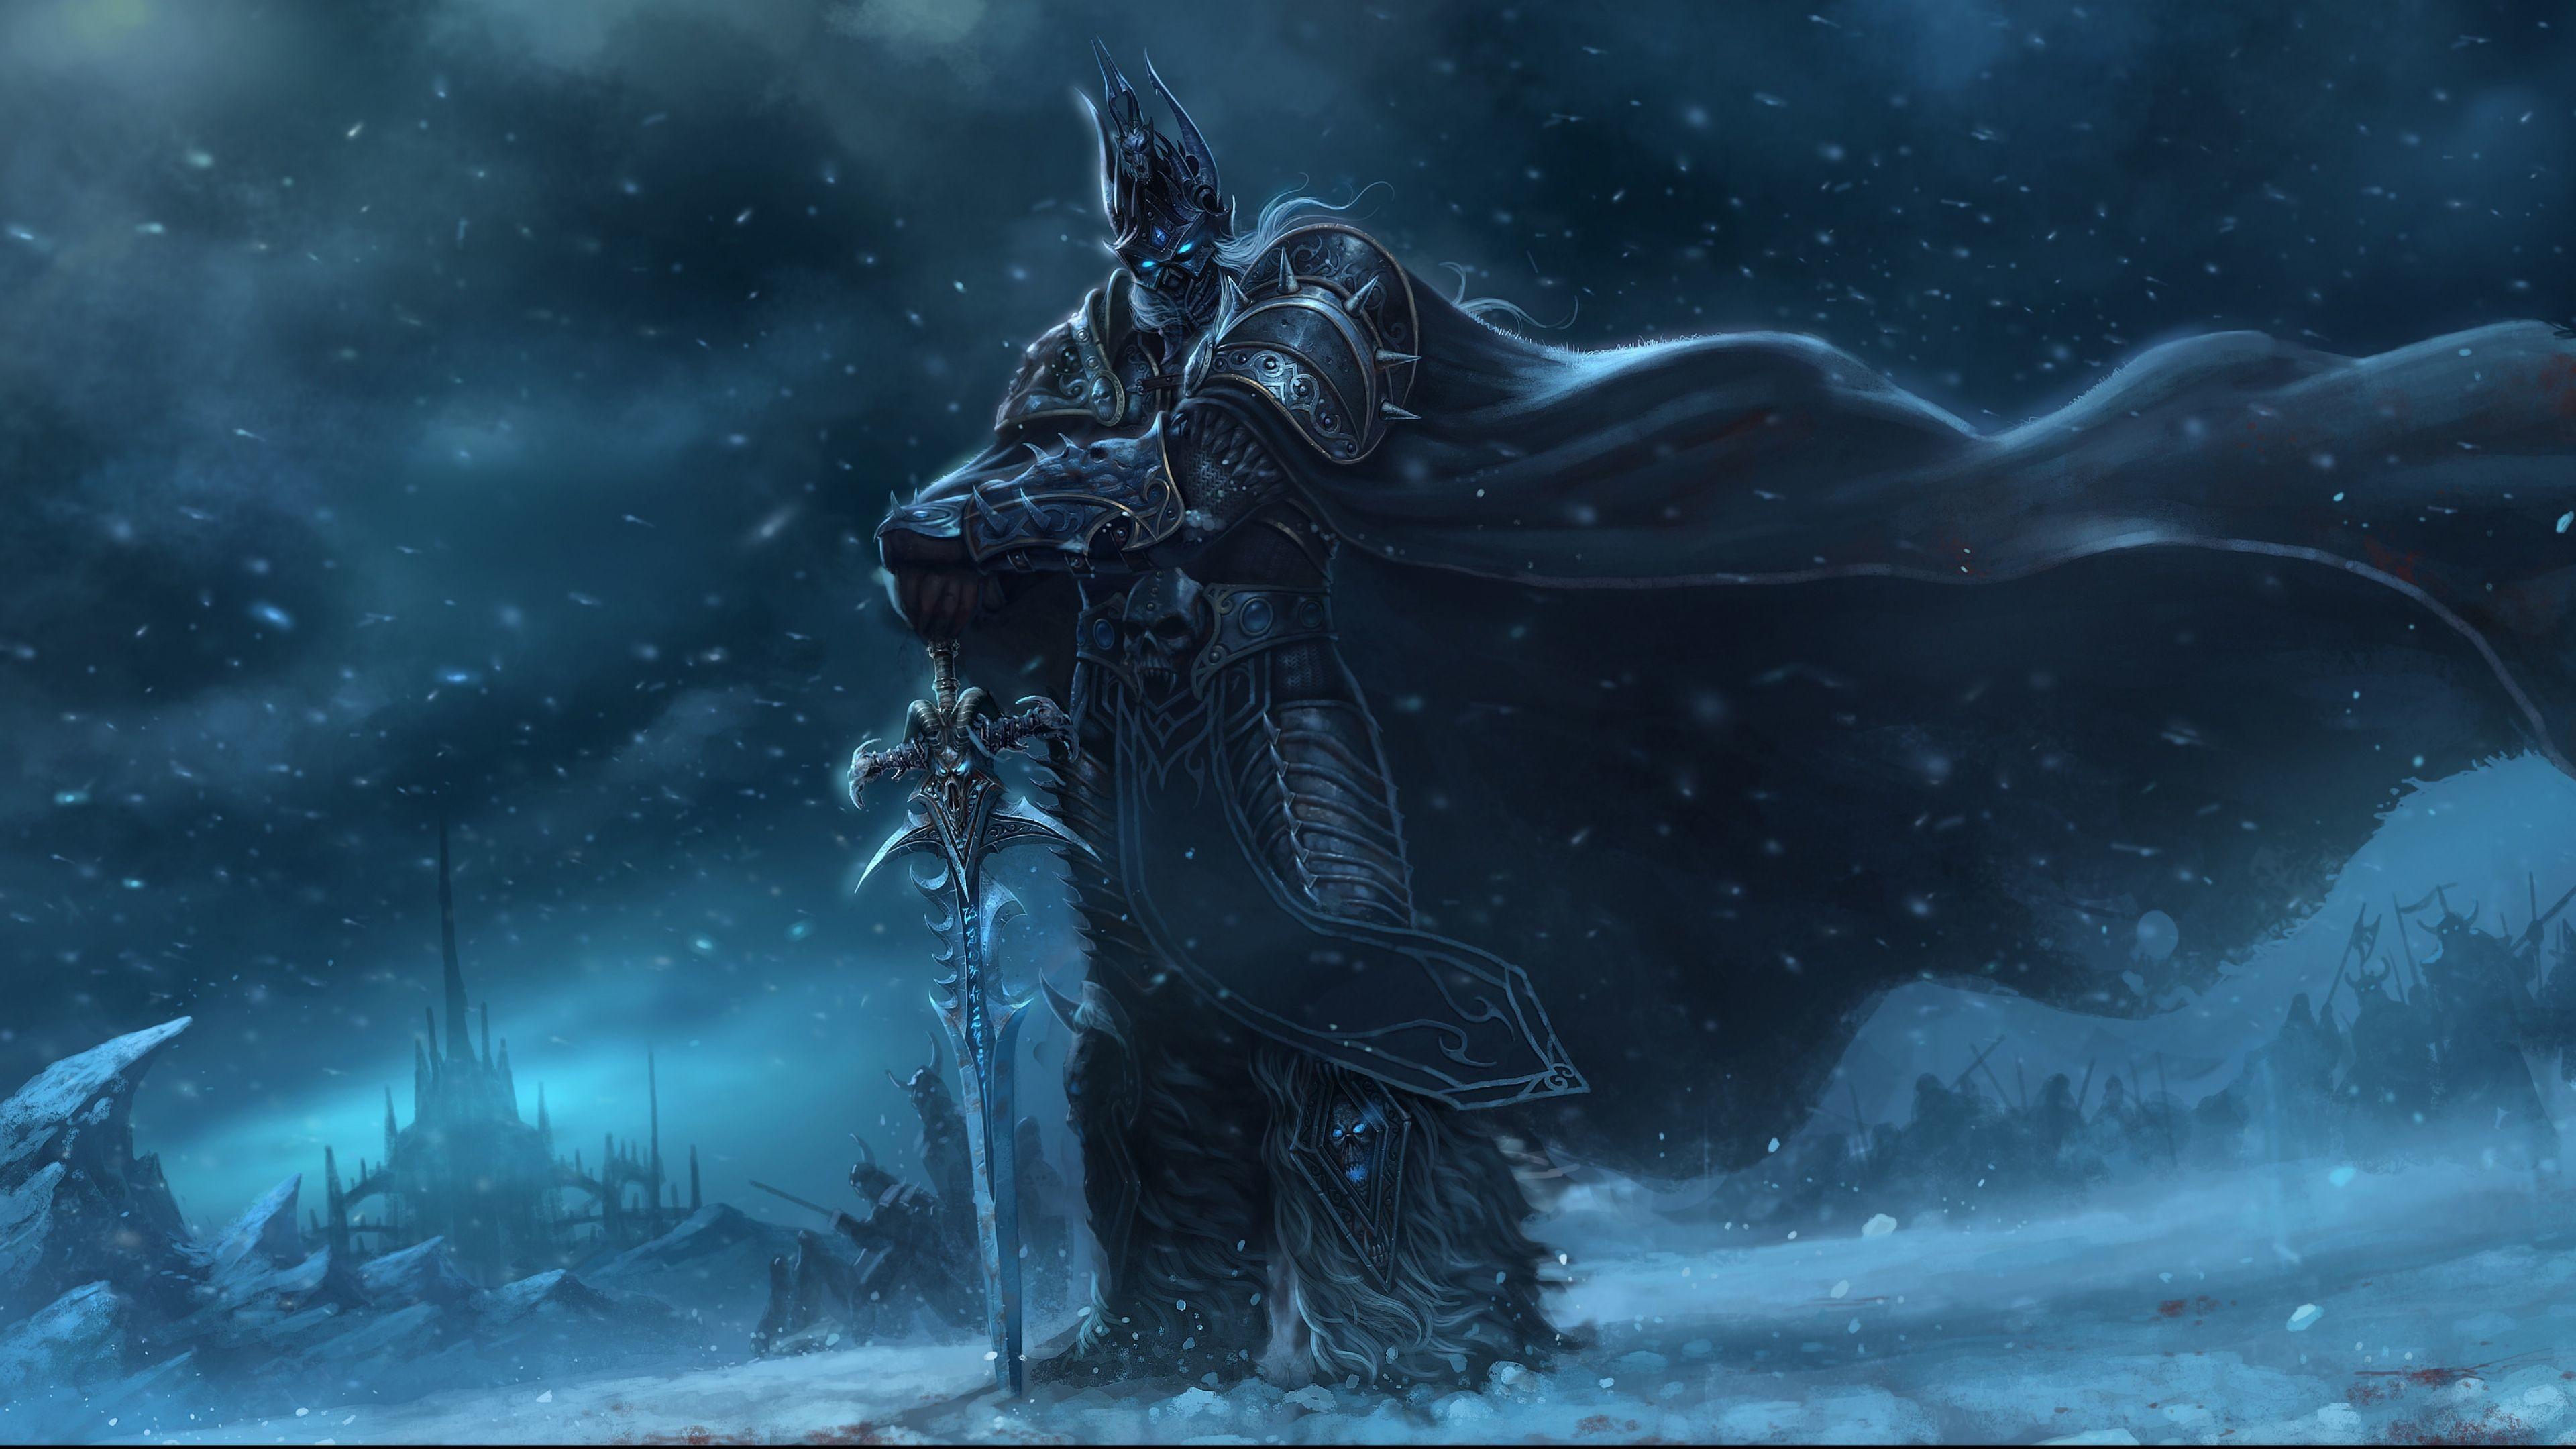 Download Wallpaper Warcraft, Wow, World of warcraft .